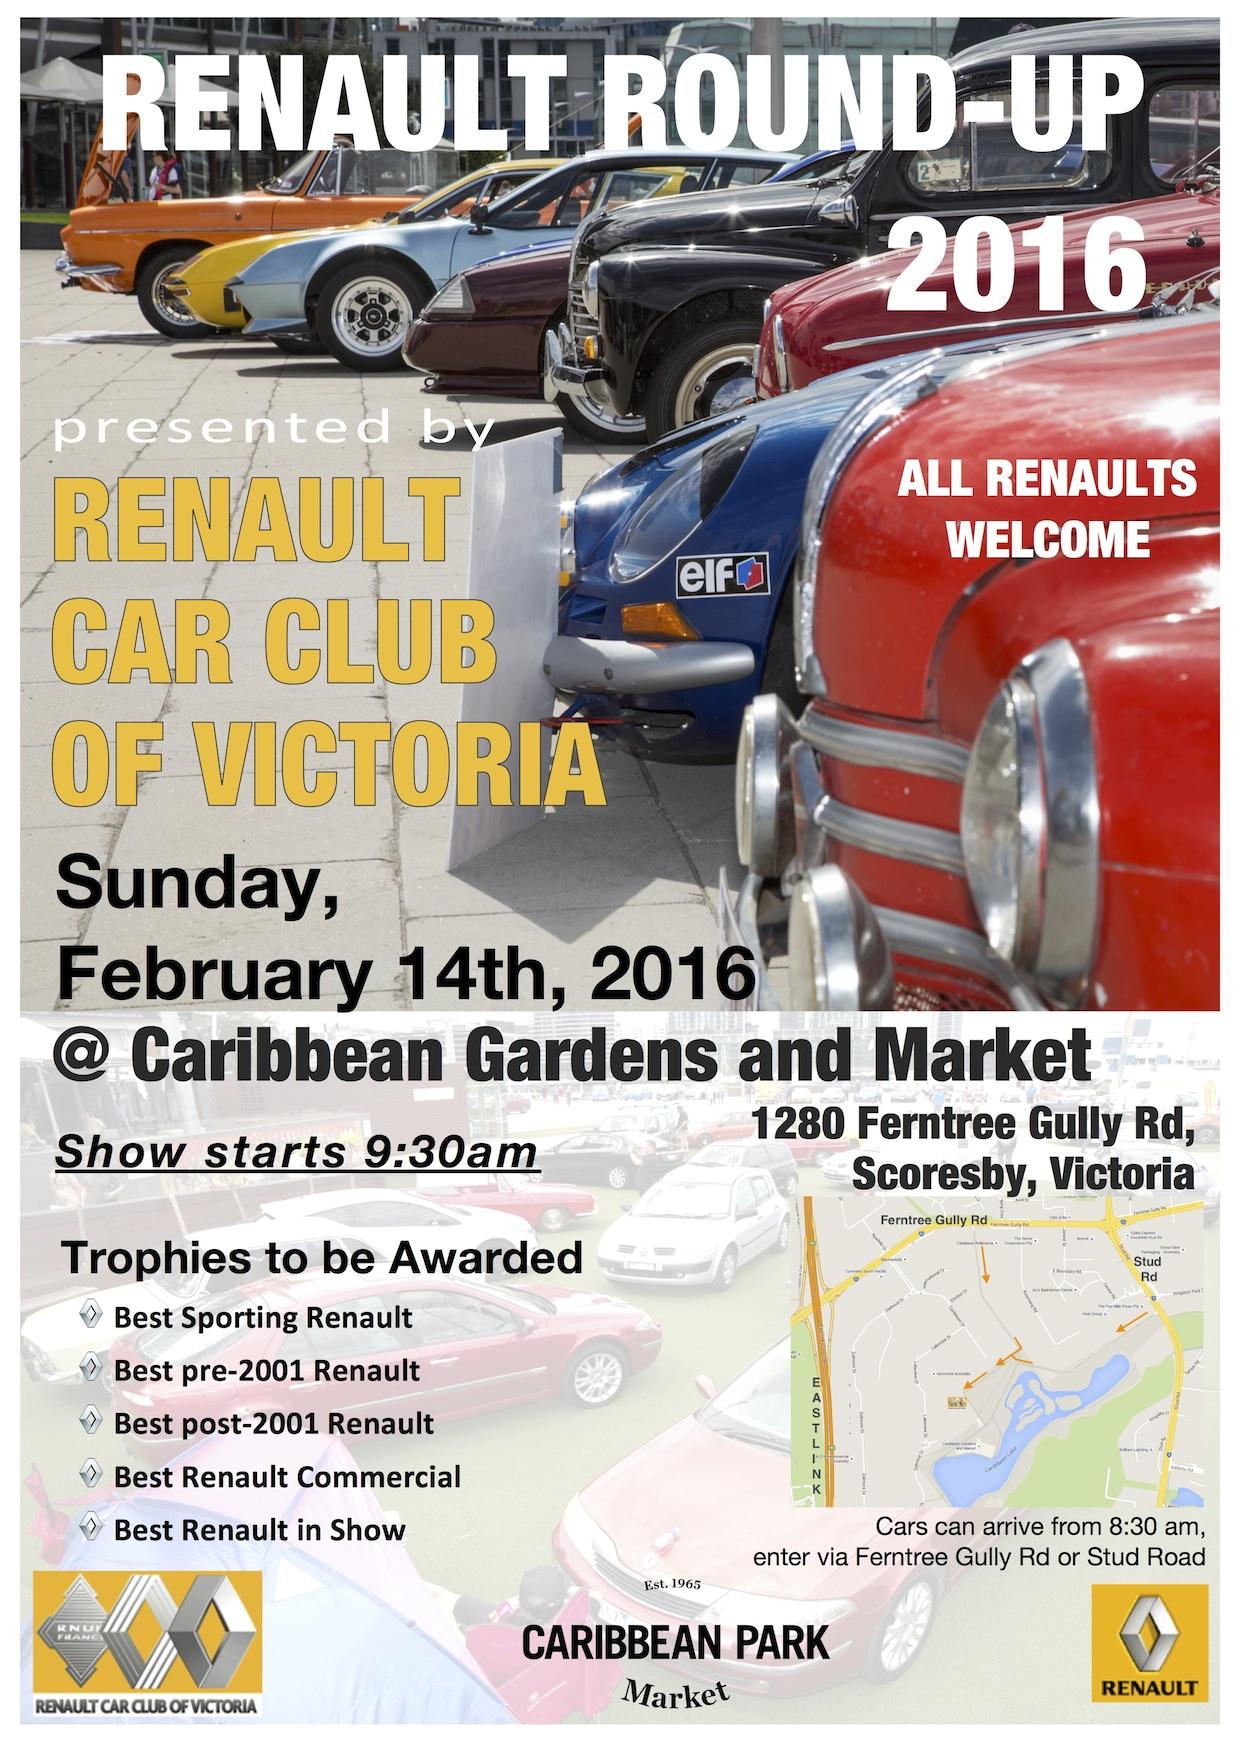 Renault Round-up 2016 Flyer